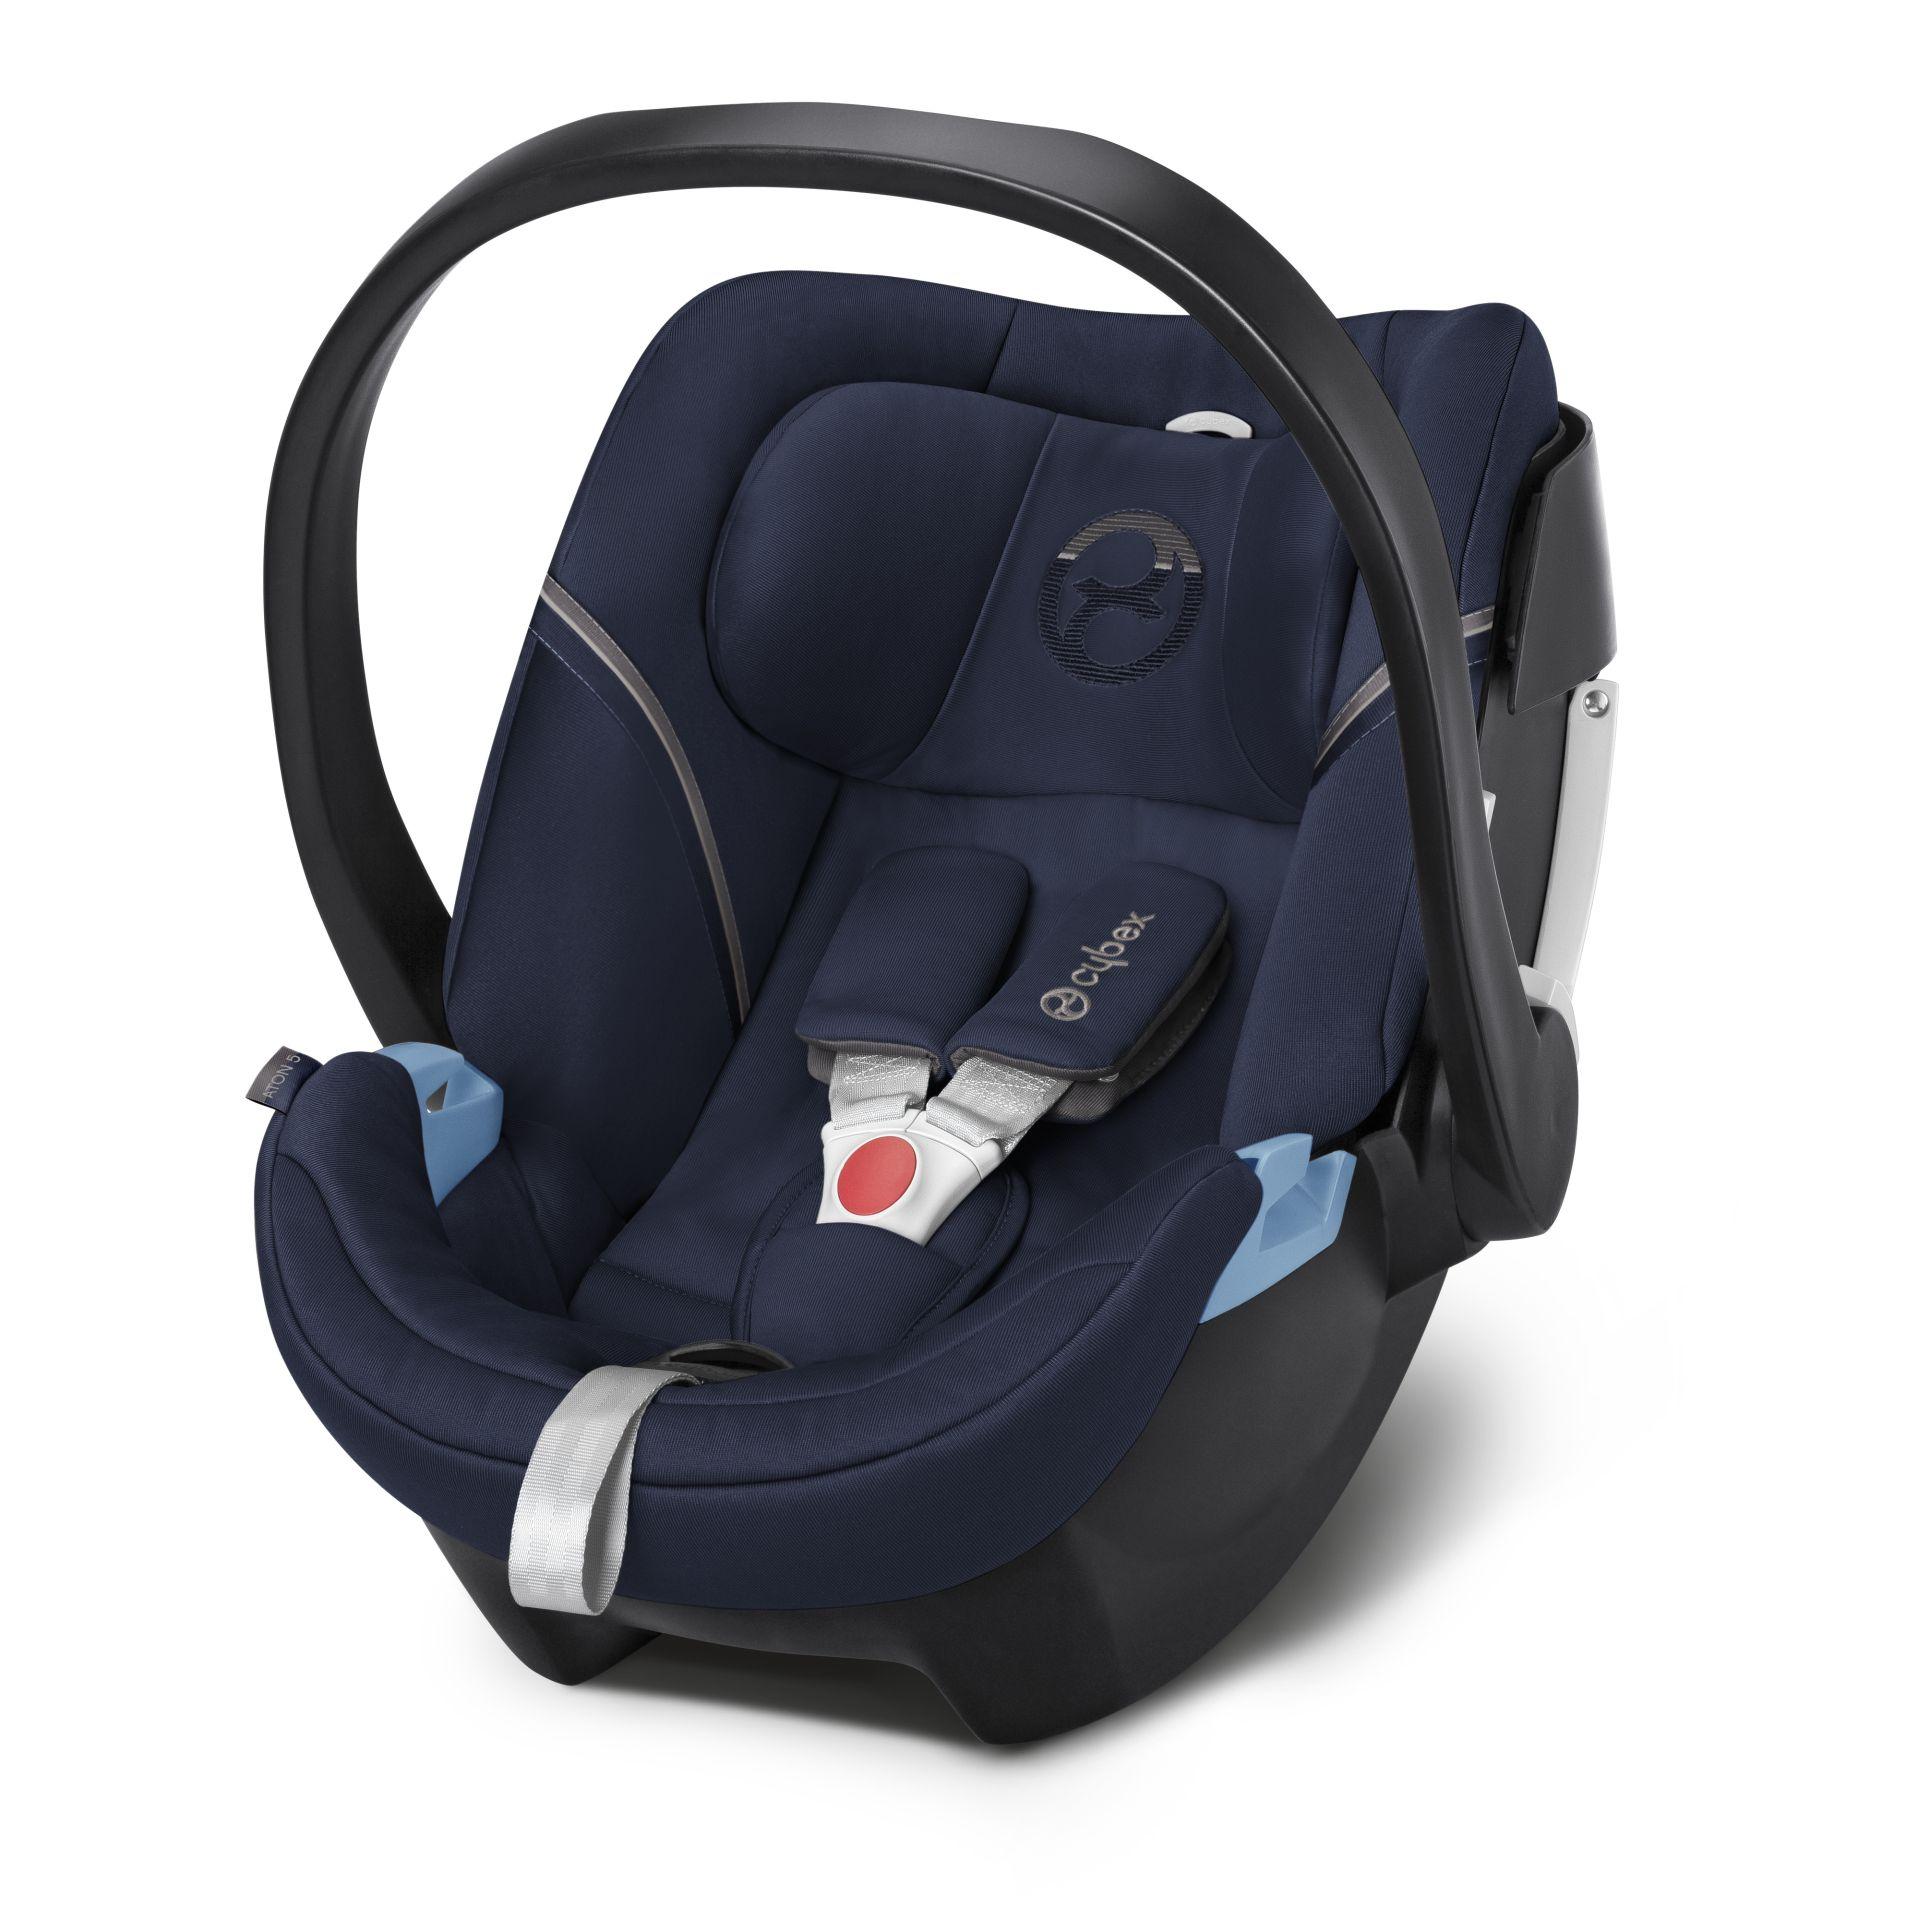 Cybex ATON 5 嬰兒提籃型安全座椅/ 嬰兒汽座- 深夜藍 MIDNIGHT BLUE